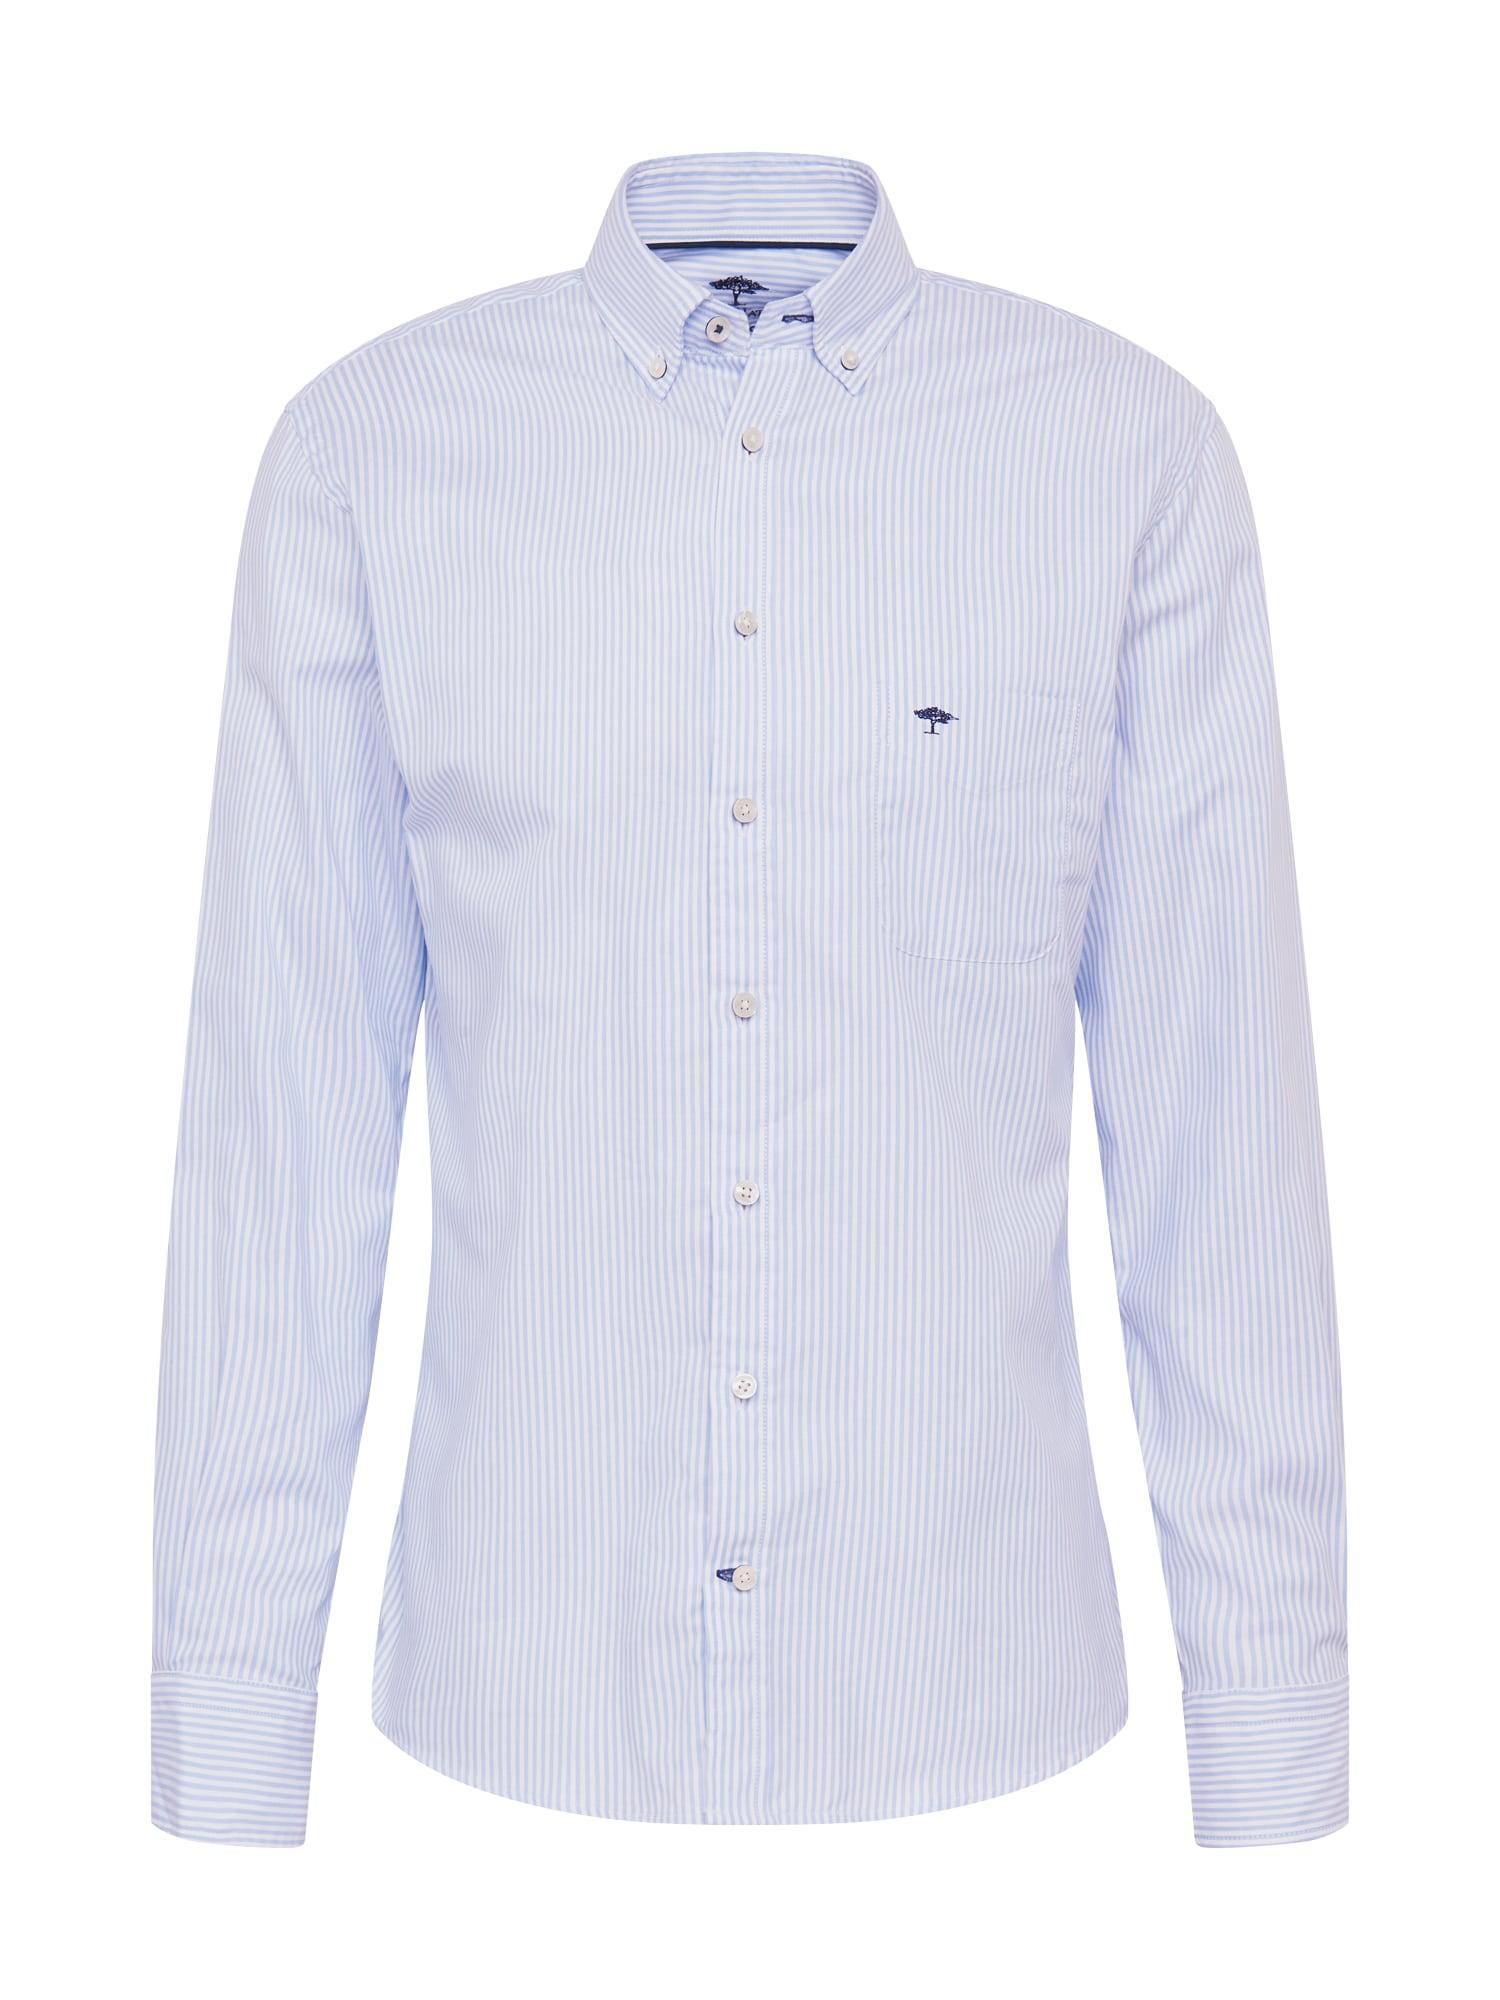 FYNCH-HATTON Marškiniai balta / šviesiai mėlyna